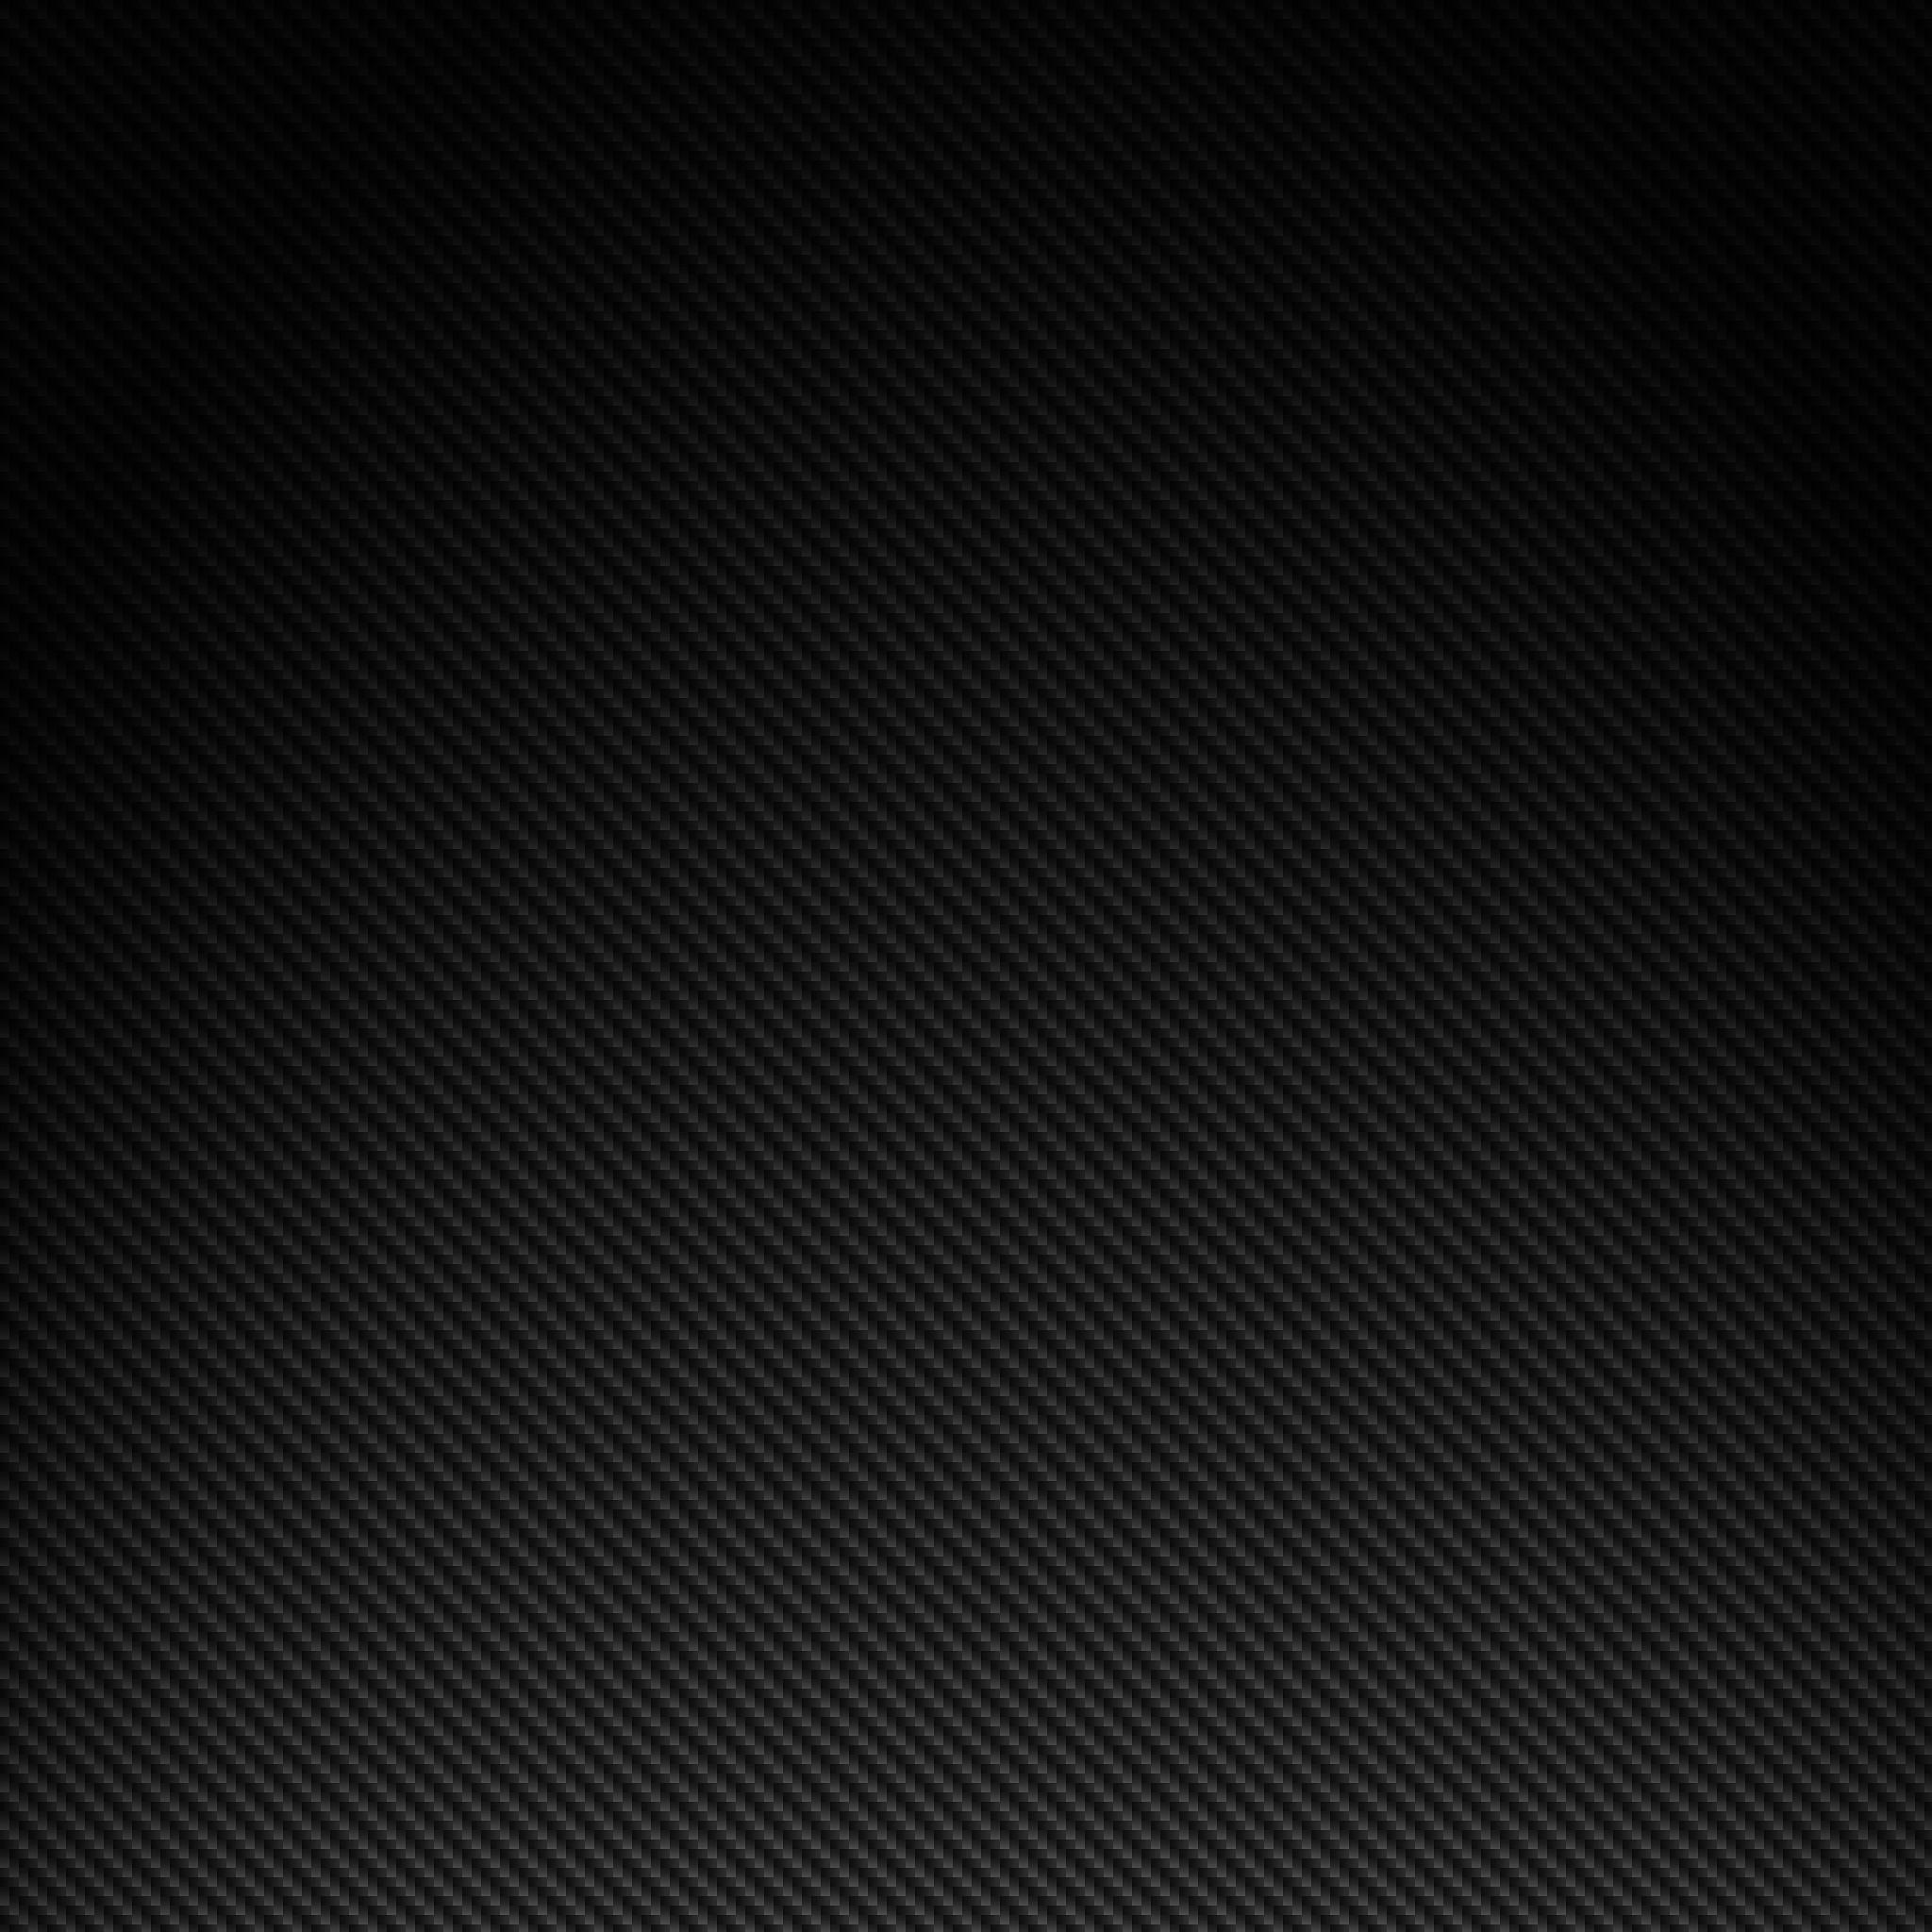 Carbon Fiber 01.jpg